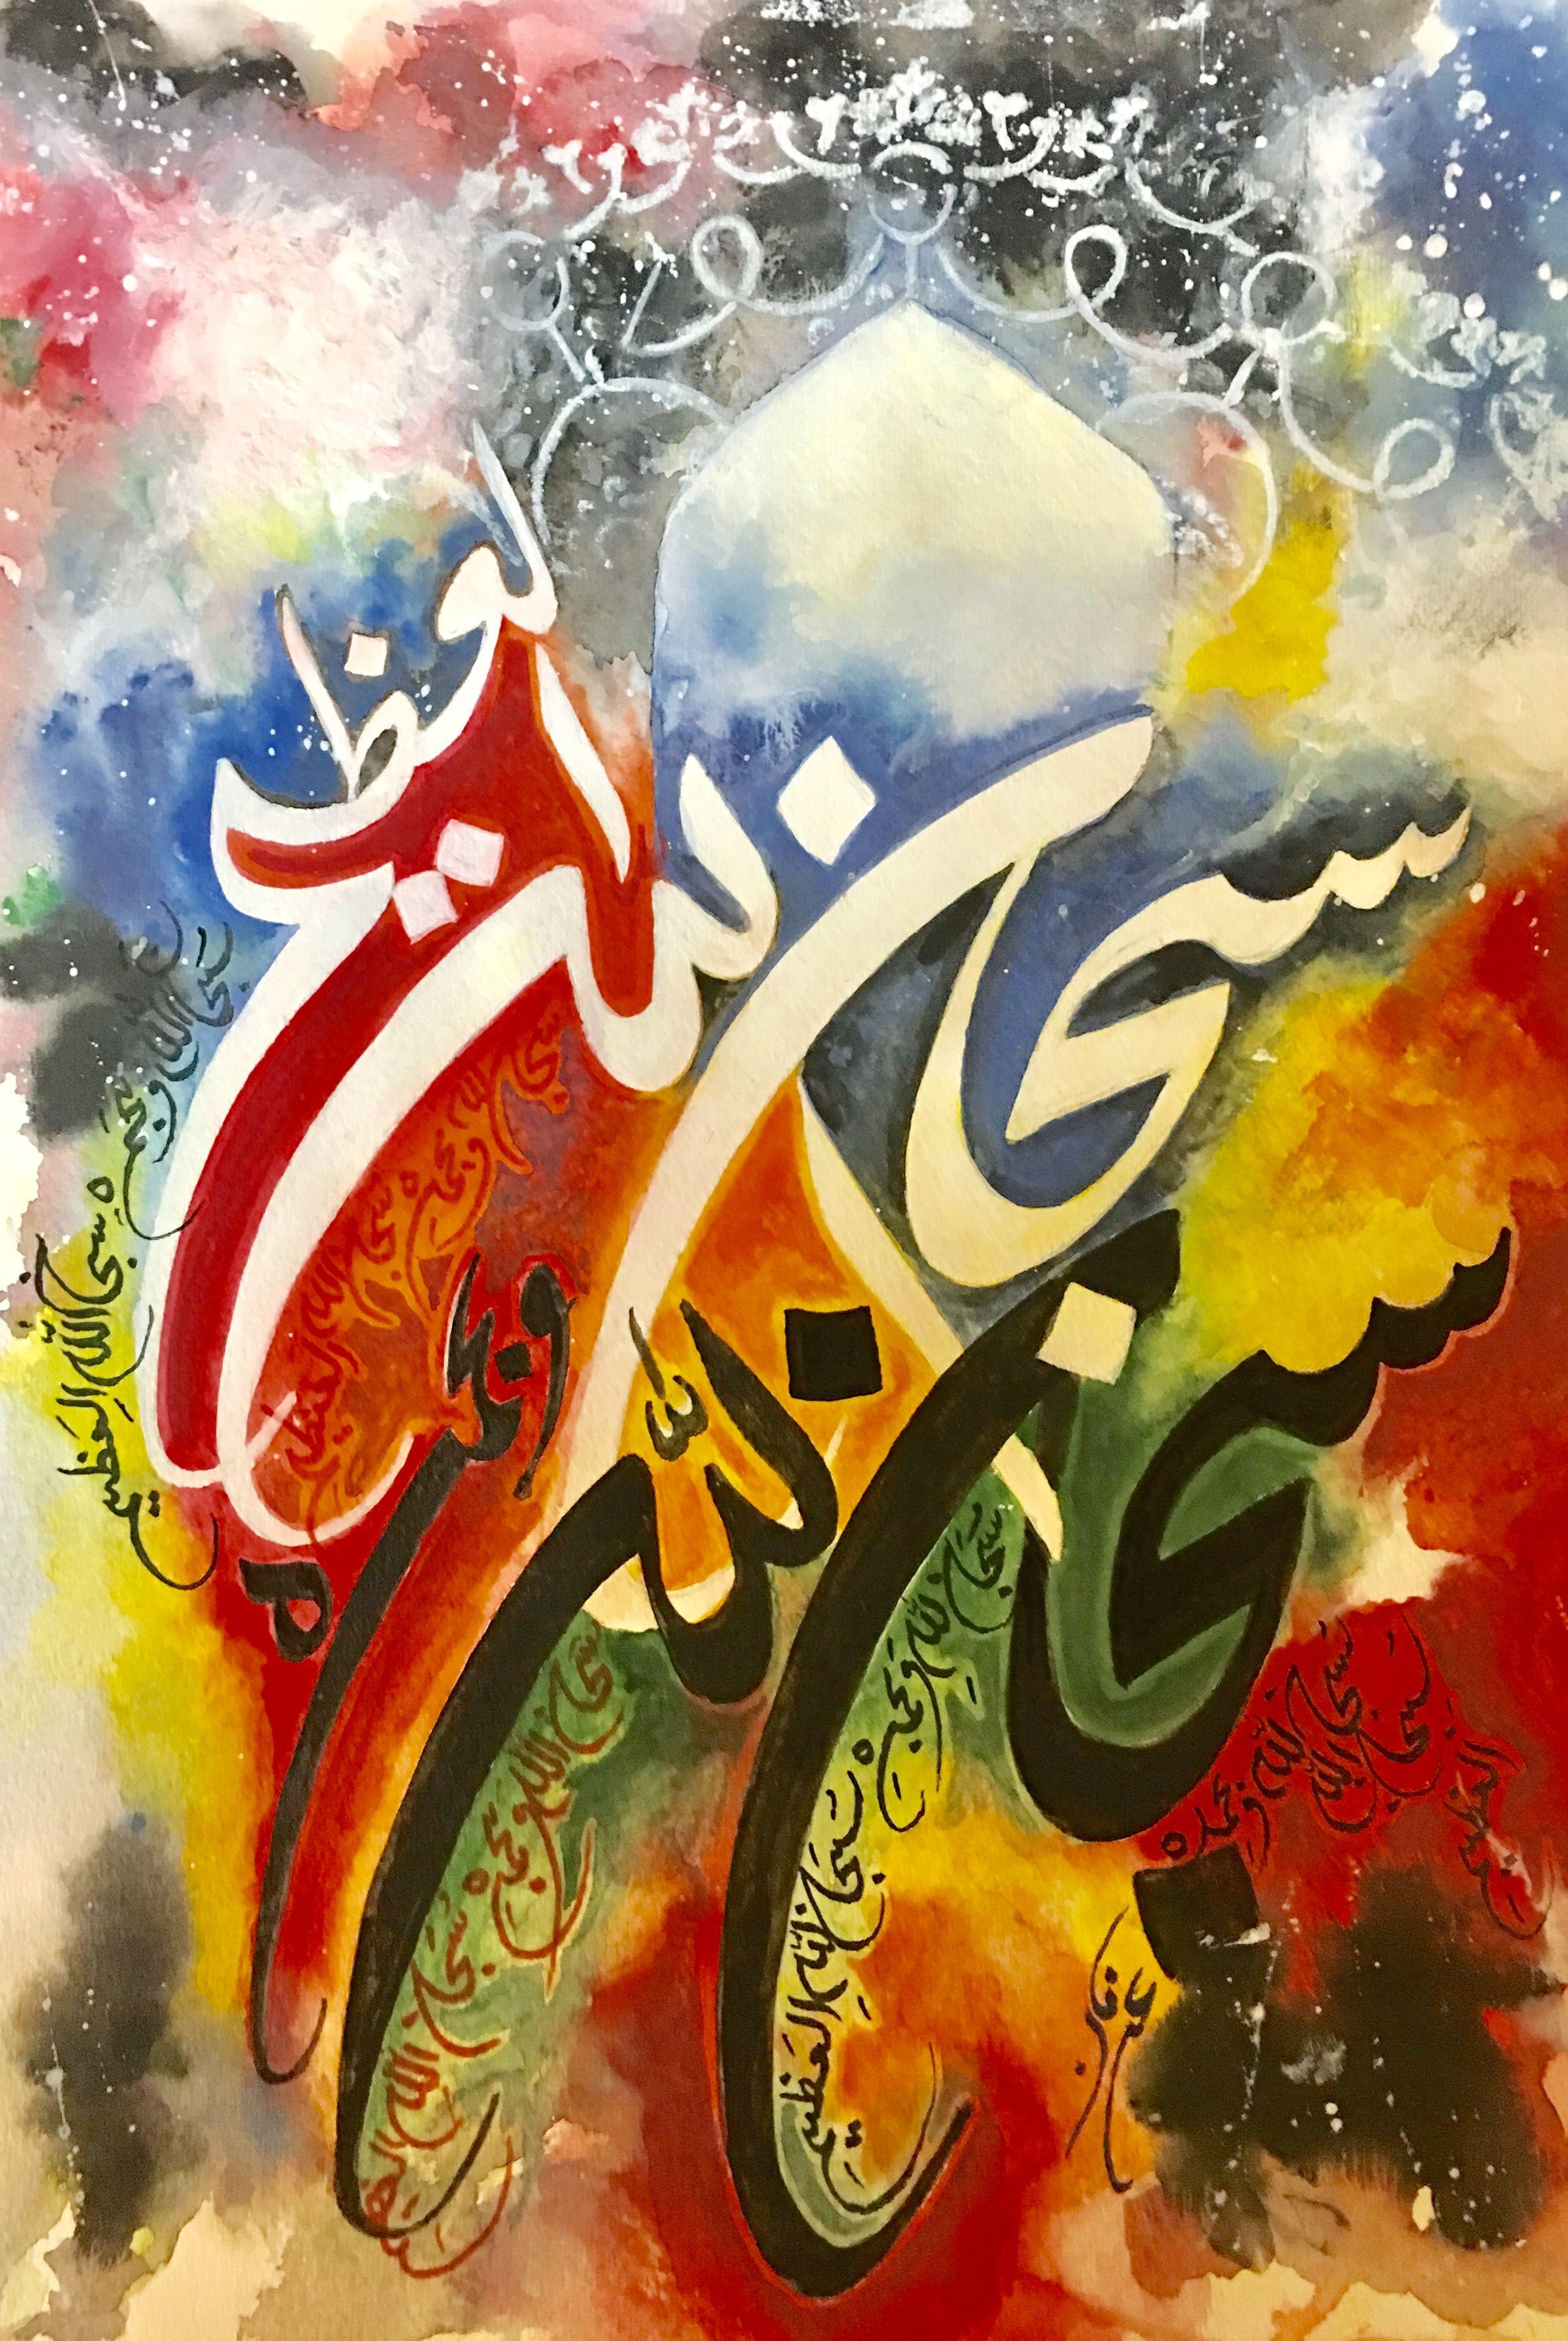 Pin By Farouq Ali Jackson On Arabic Caligraphy Islamic Art Calligraphy Islamic Calligraphy Painting Islamic Art Pattern